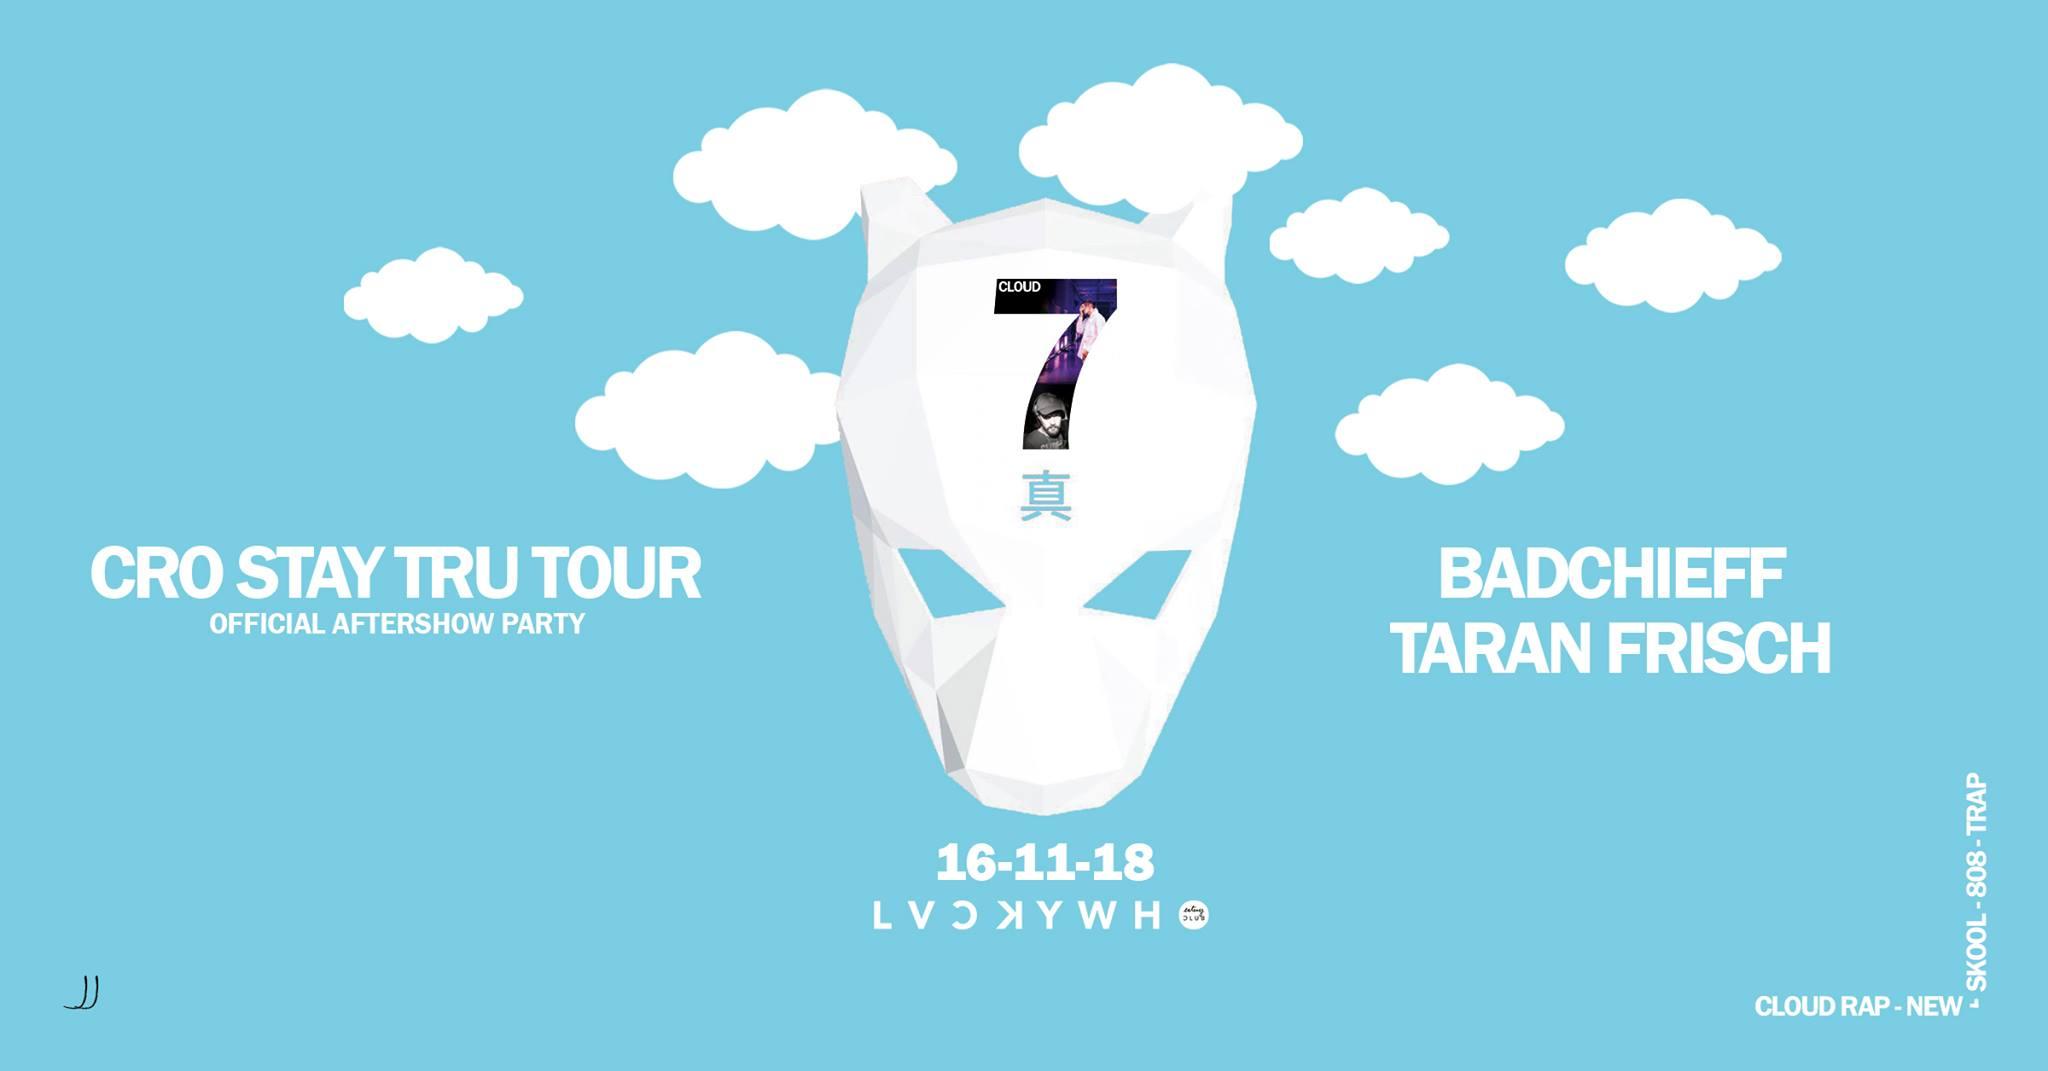 luckycro stay tru tour